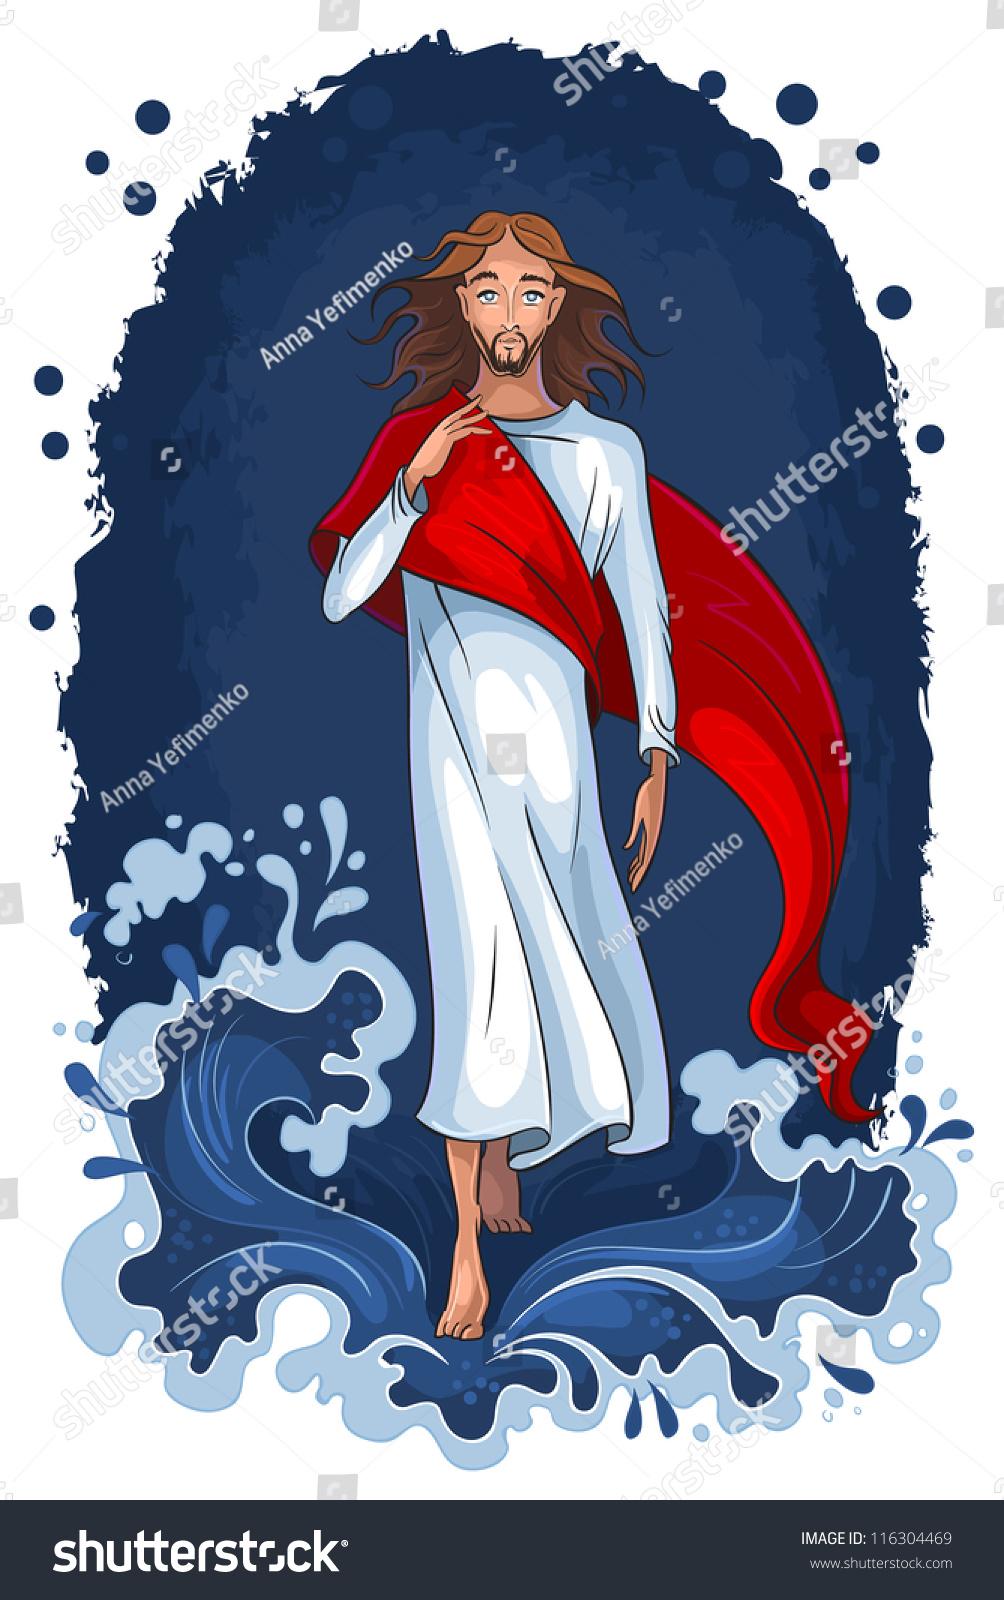 bible story jesus walking on water stock vector 116304469